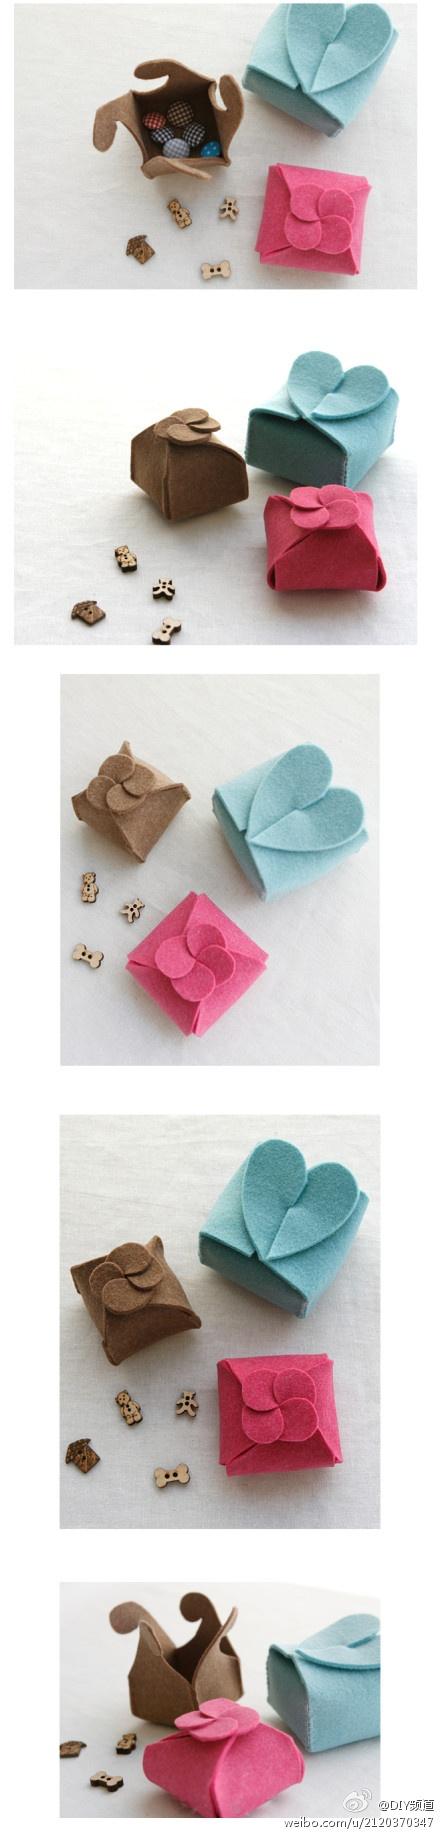 gift boxes of felt